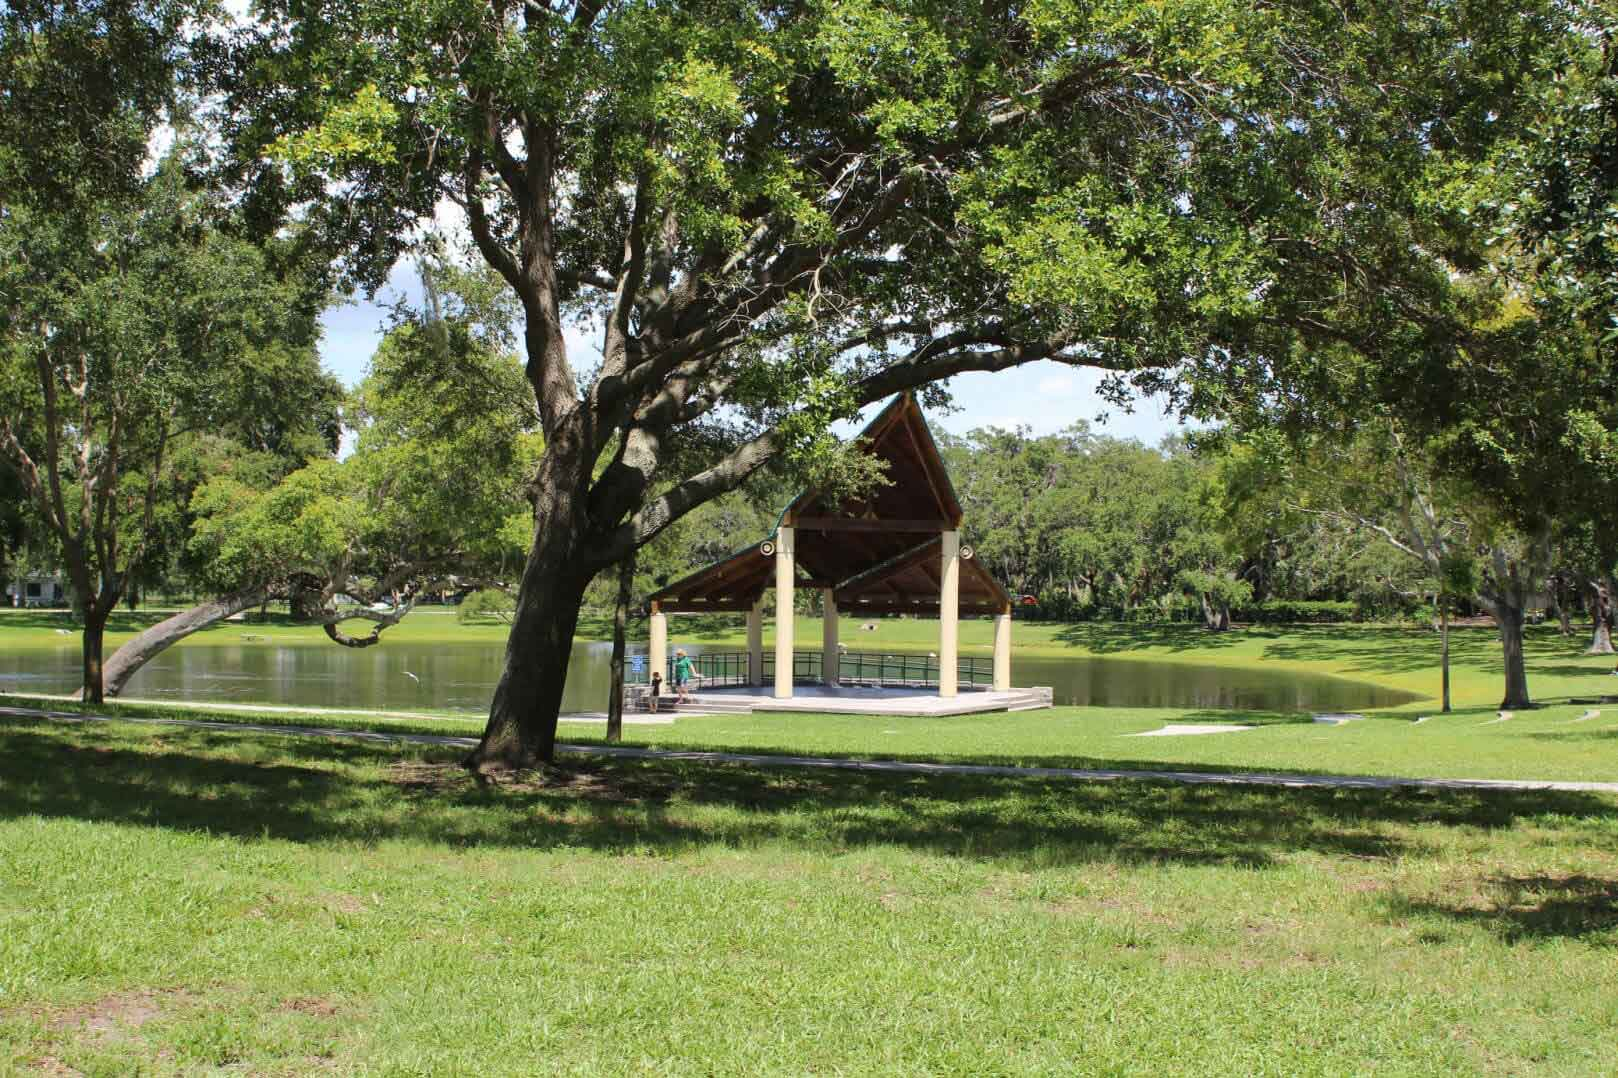 Seminole, Florida - Official Website of the City of Seminole